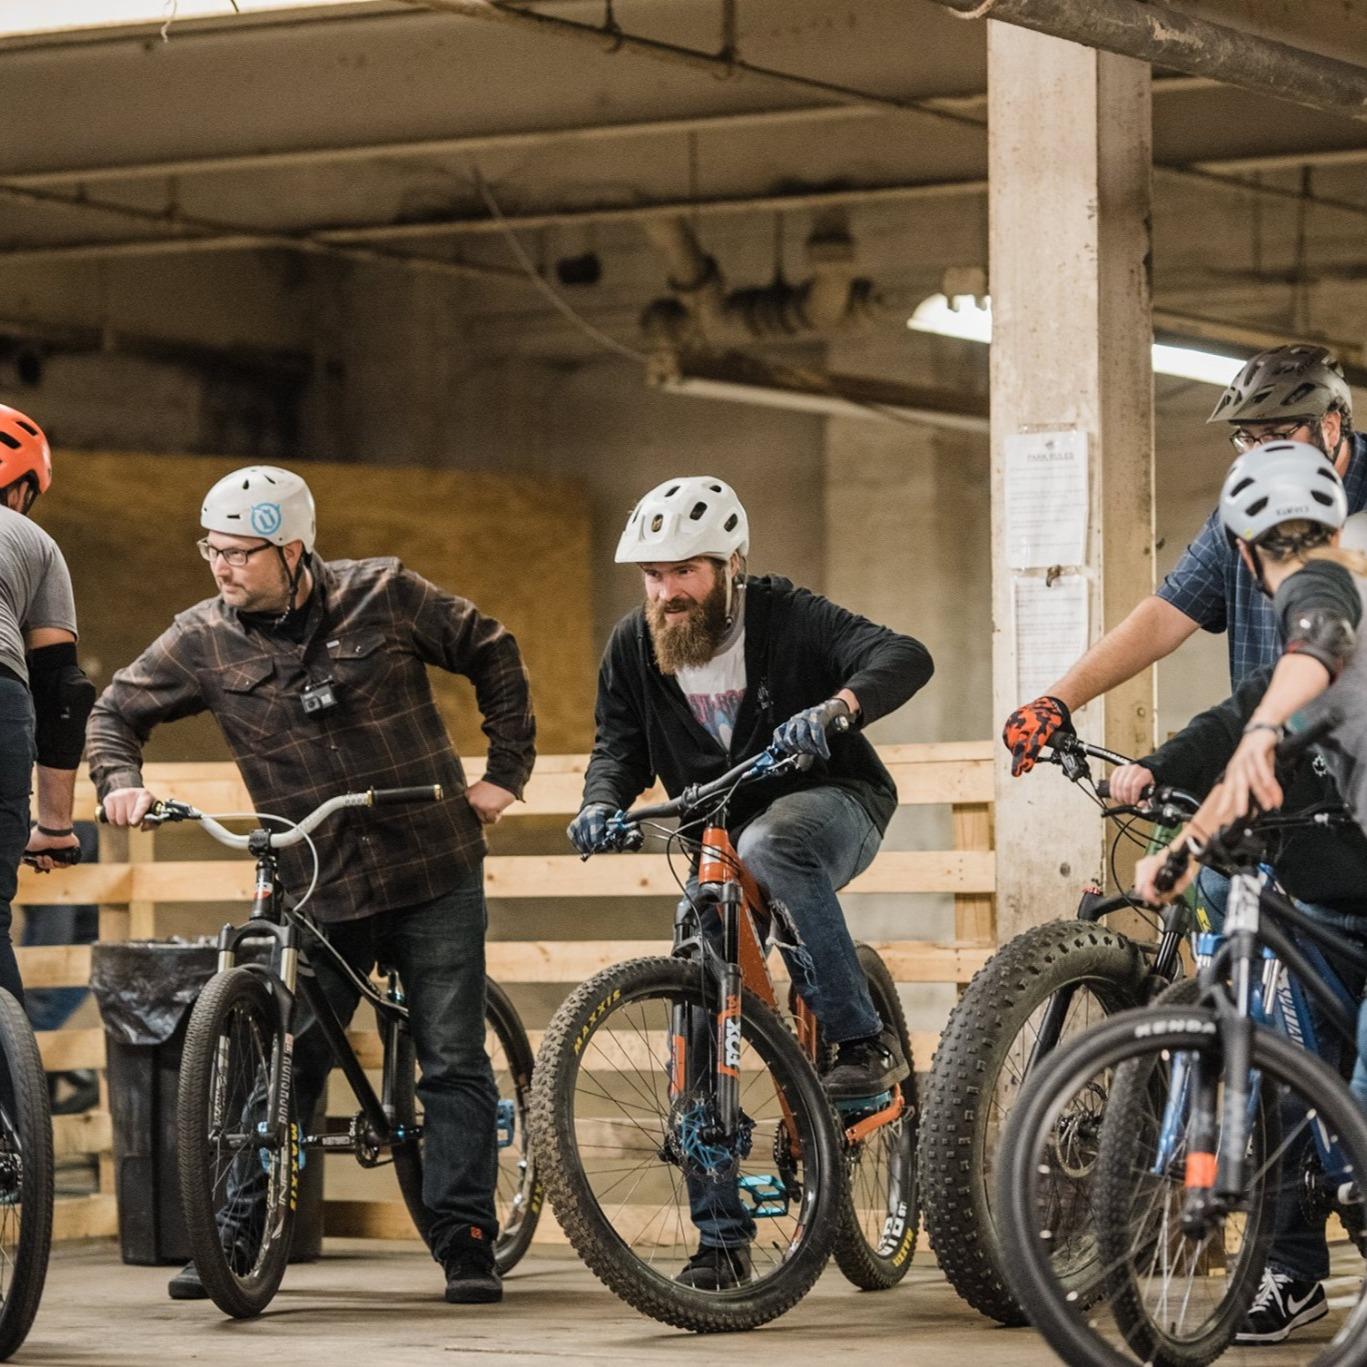 Friends riding Bikes